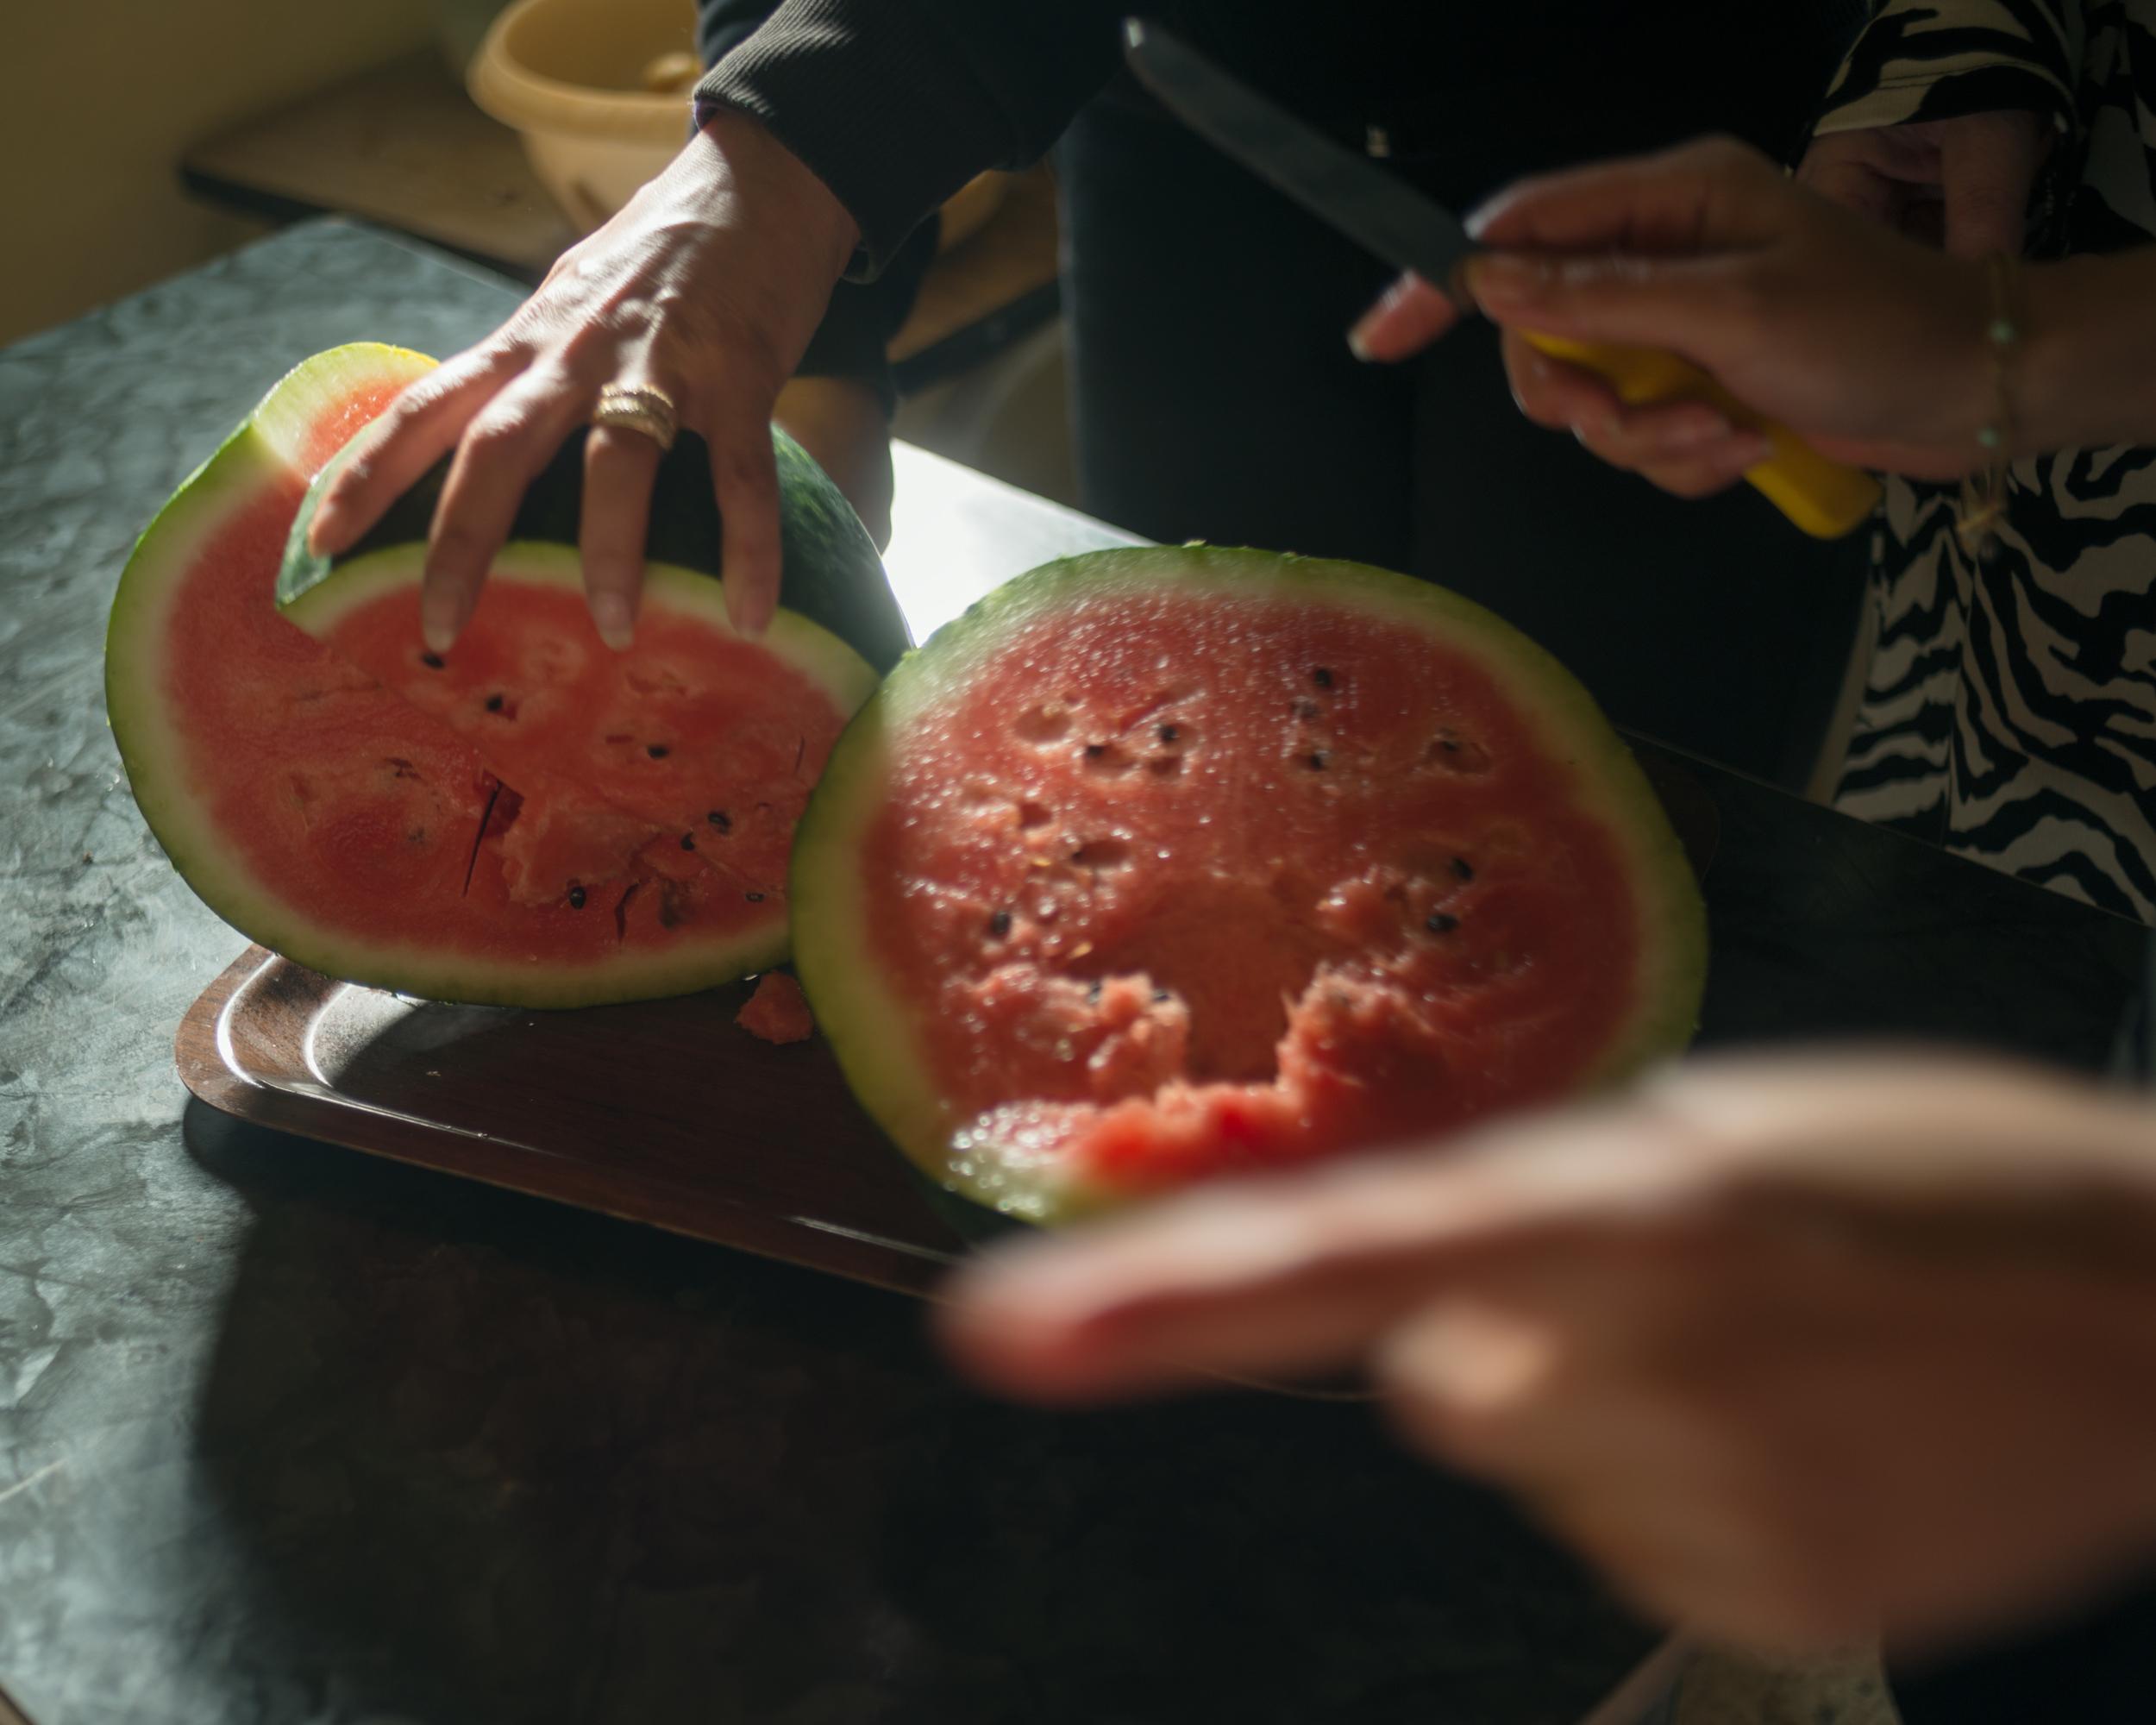 blurrywatermelon.jpg